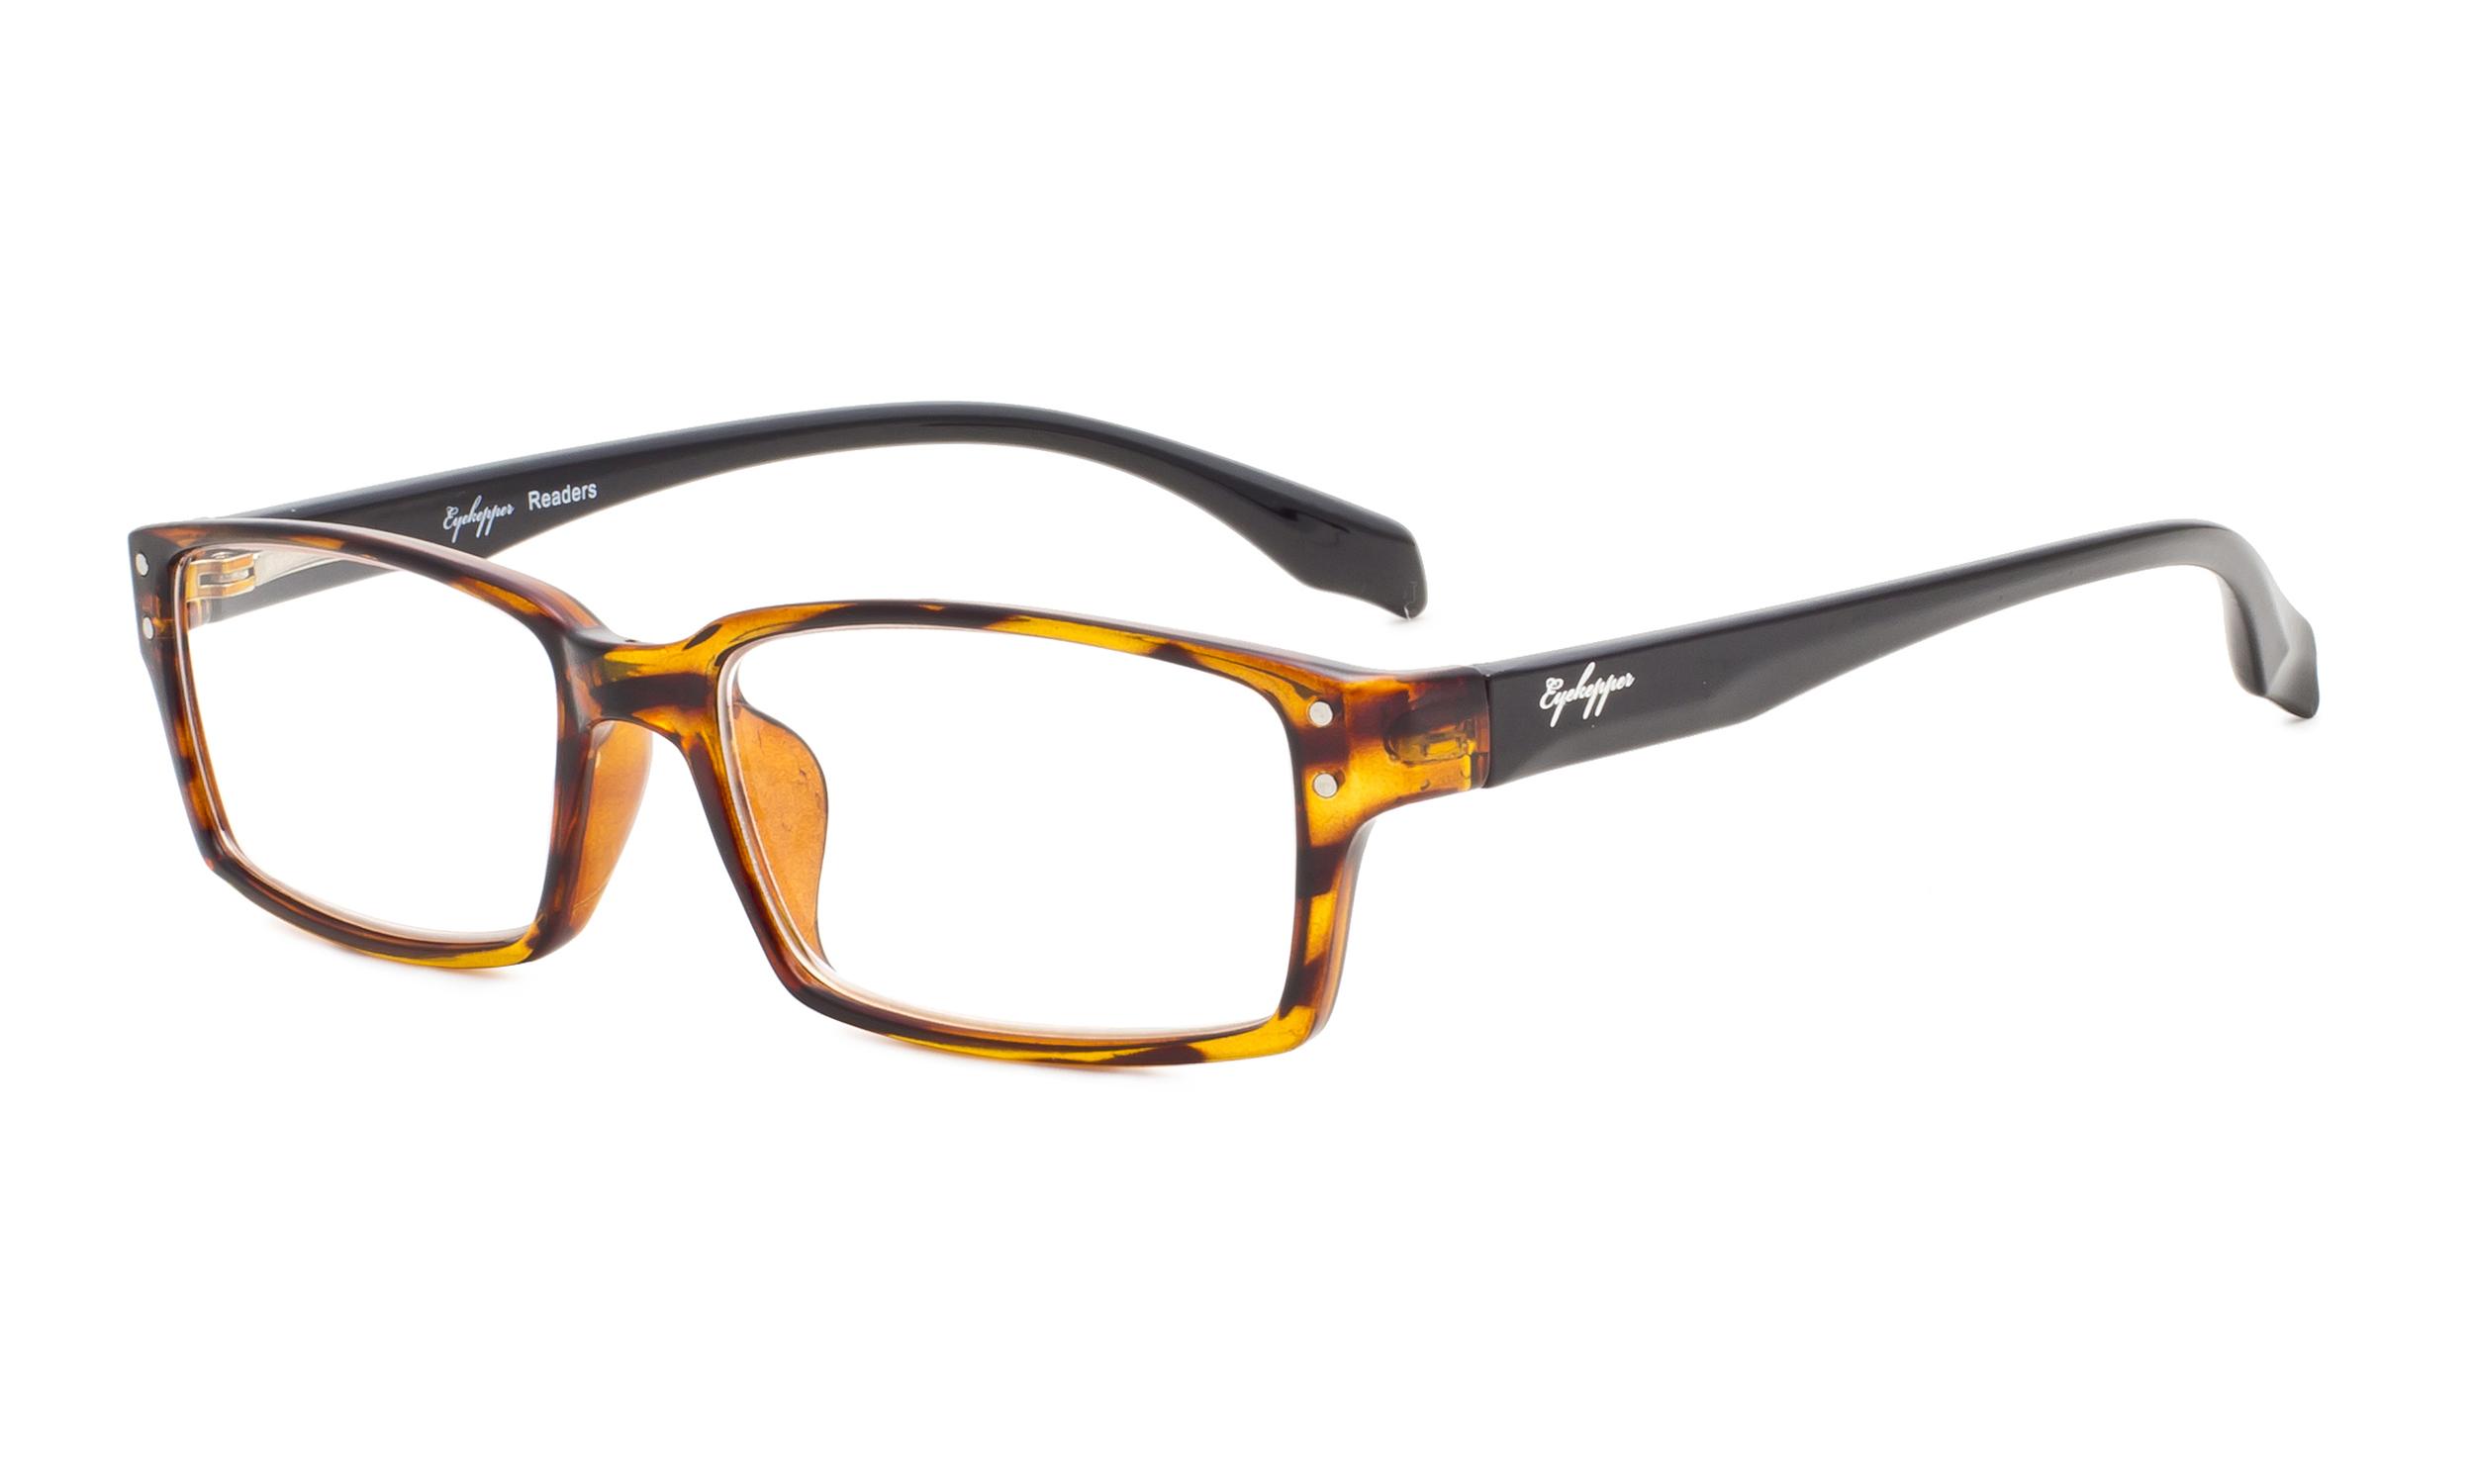 e5ff834ff11b Eyekepper Reading Glasses Classic rectangle Full Frame with Spring-Hinges  Classic Readers Women Men Amber/Black Arm R096